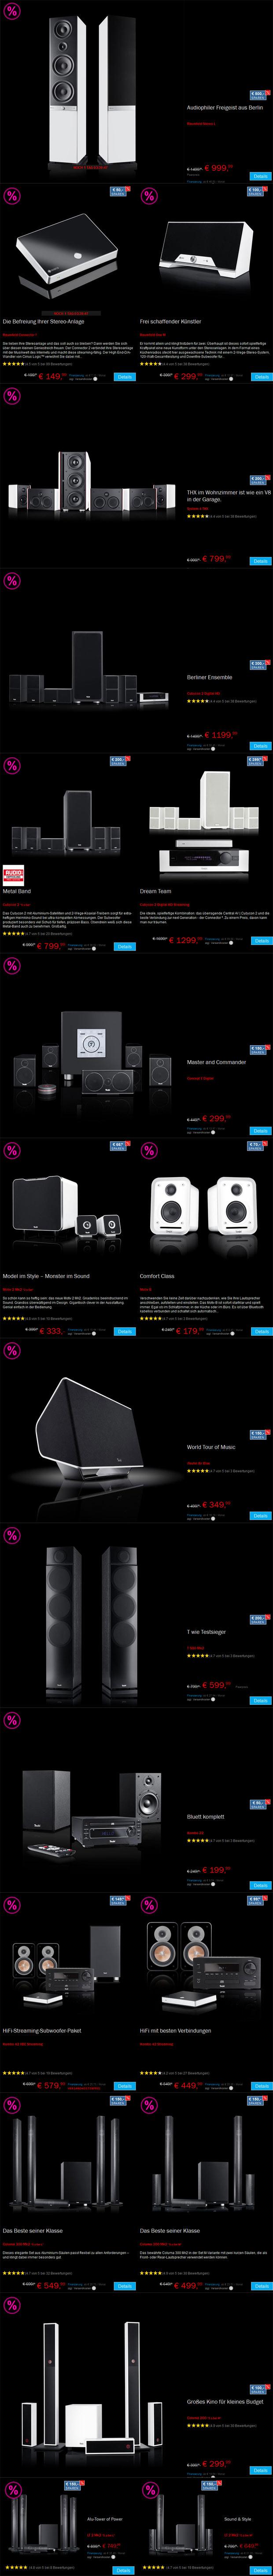 Teufel-Cyber-Monday-2014-Produkte